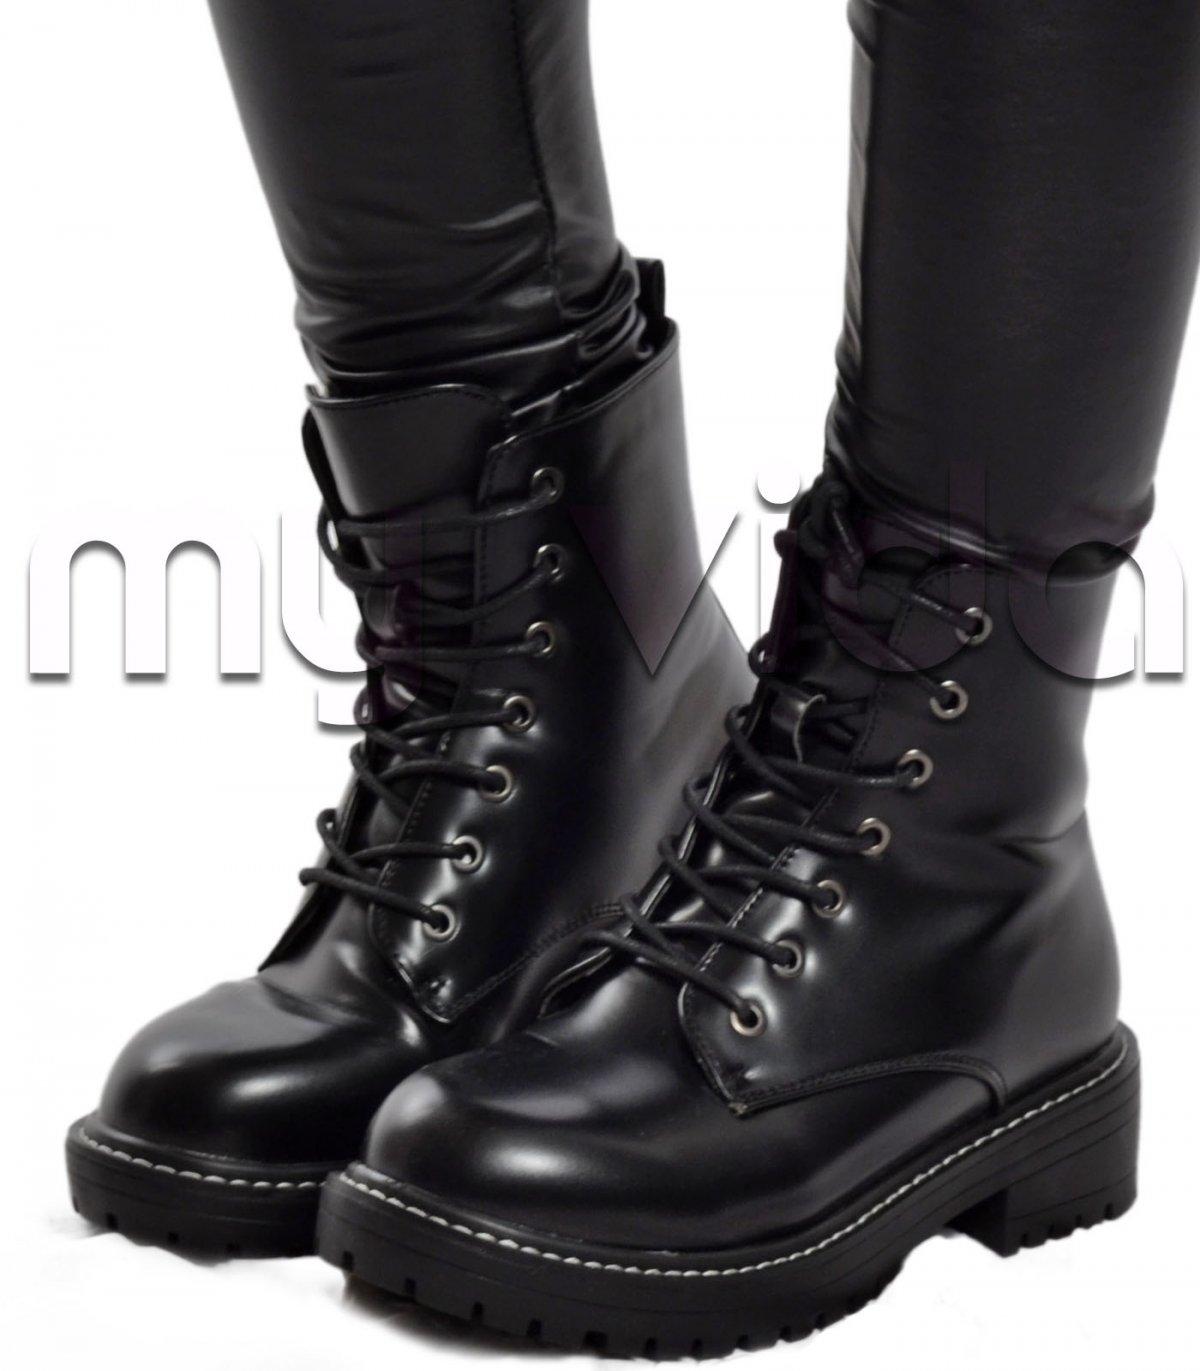 finest selection 89c74 da7d1 Scarpe donna stivaletti anfibi biker boots   My Vida